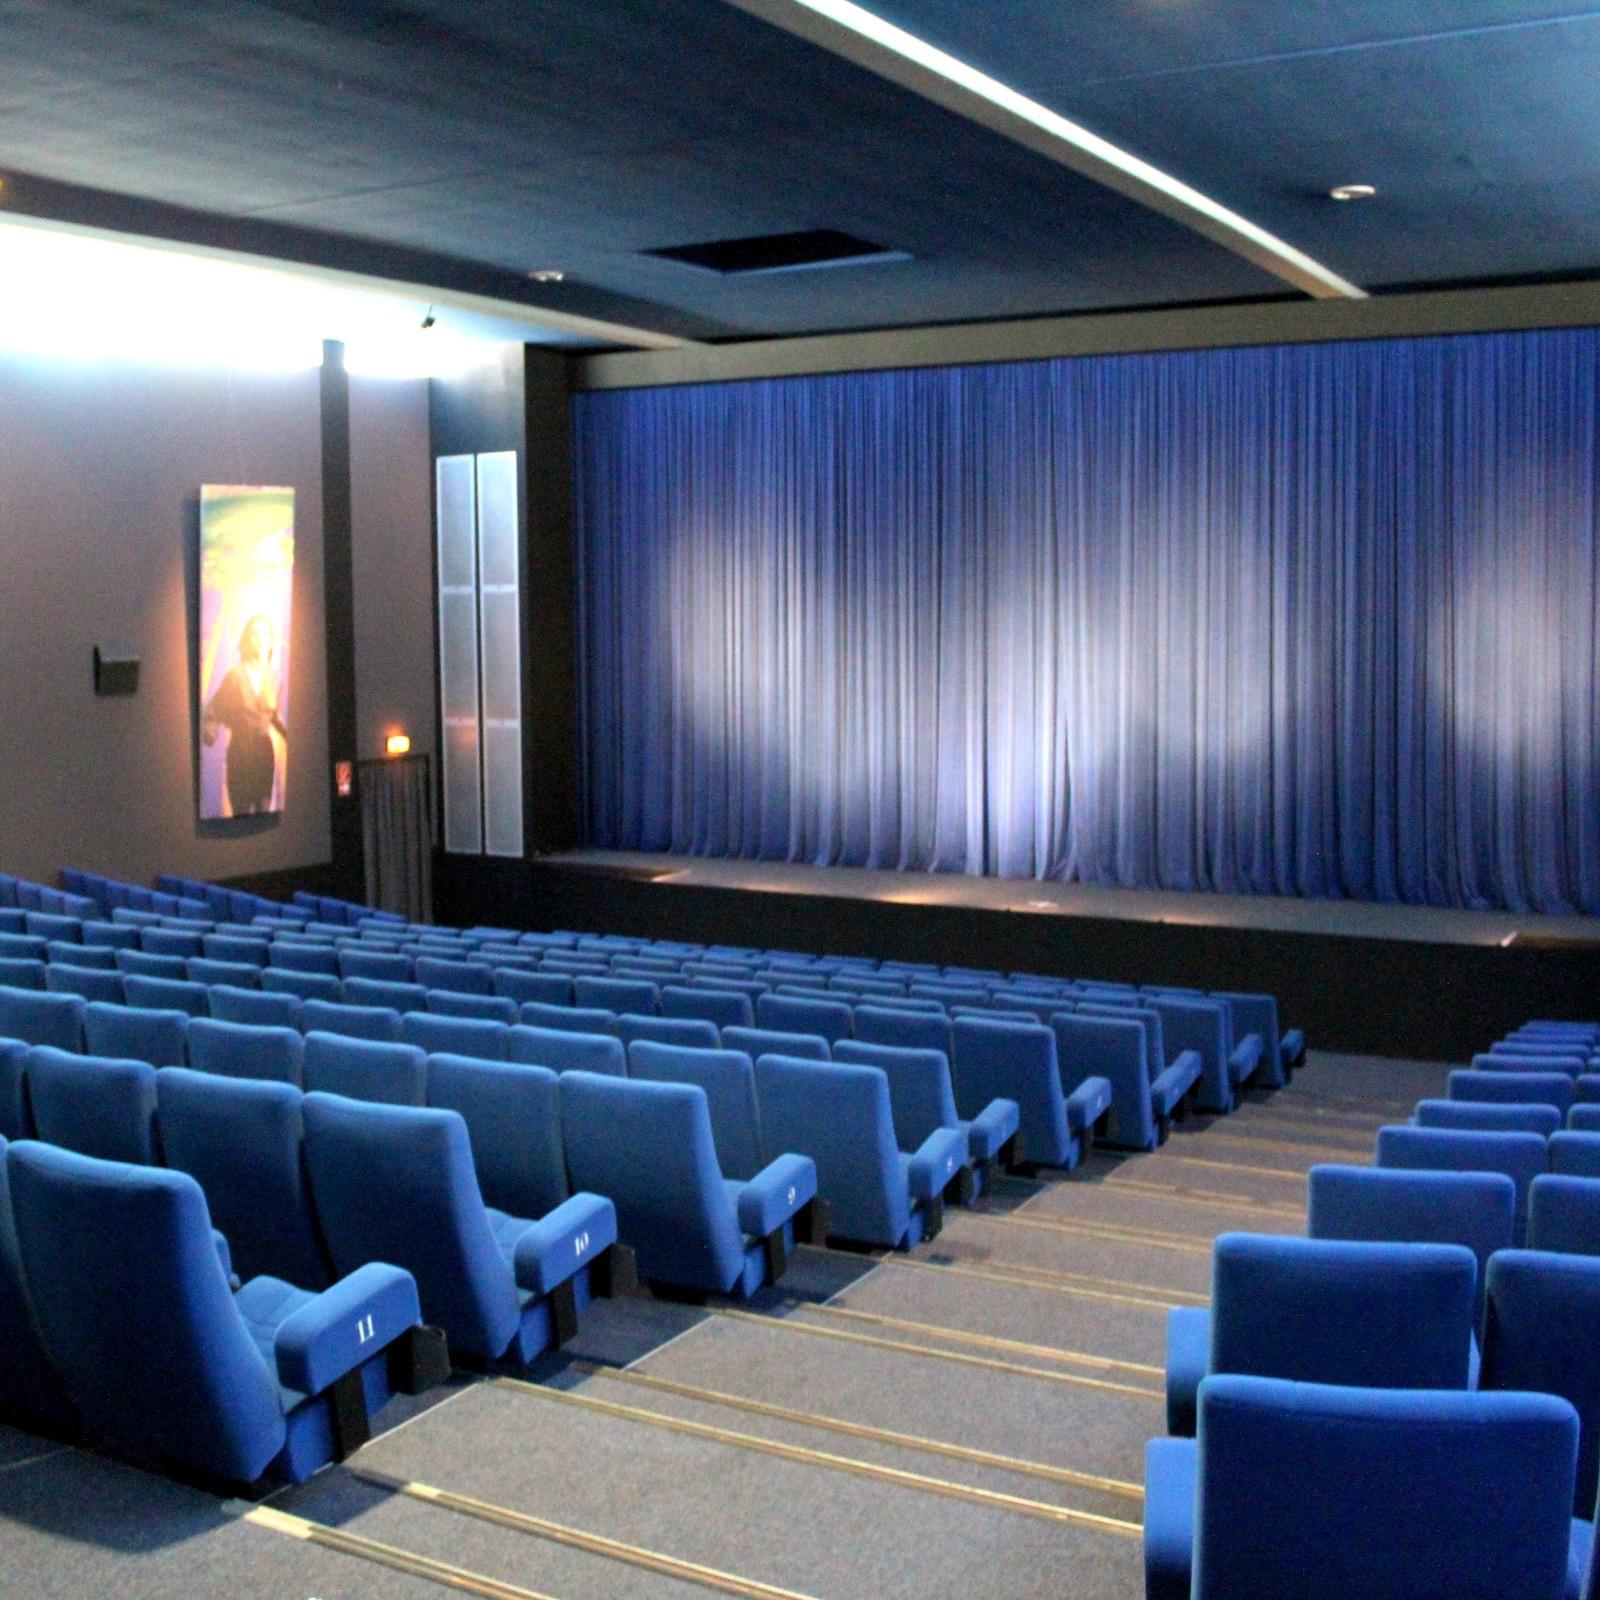 Kino Ehrenfeld Köln